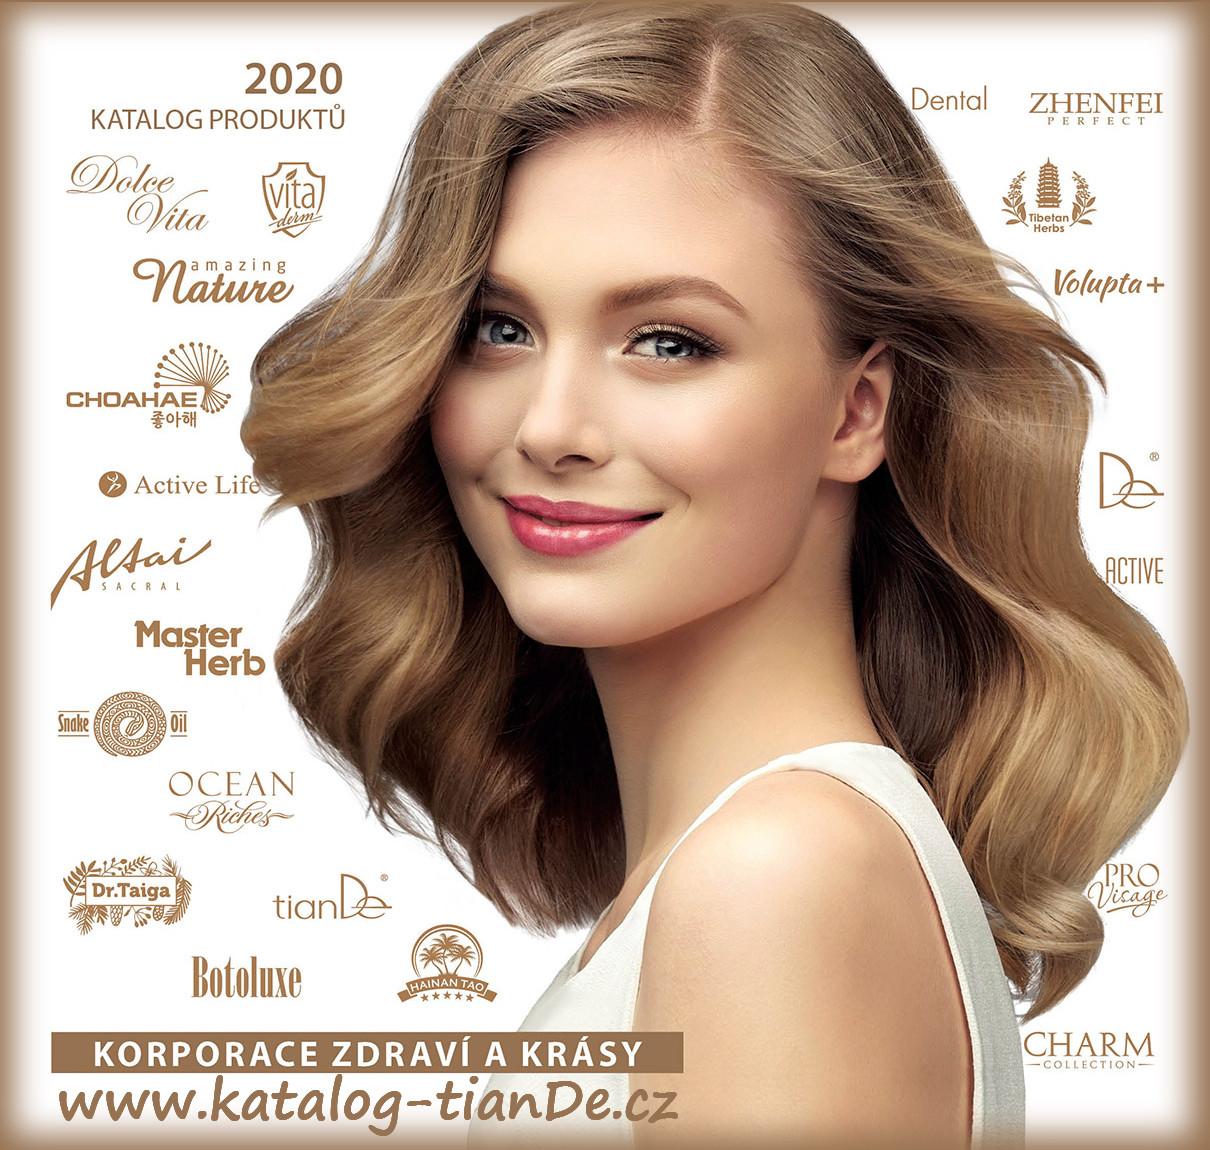 Katalog tianDe, kosmetika tianDe, tianDe katalog